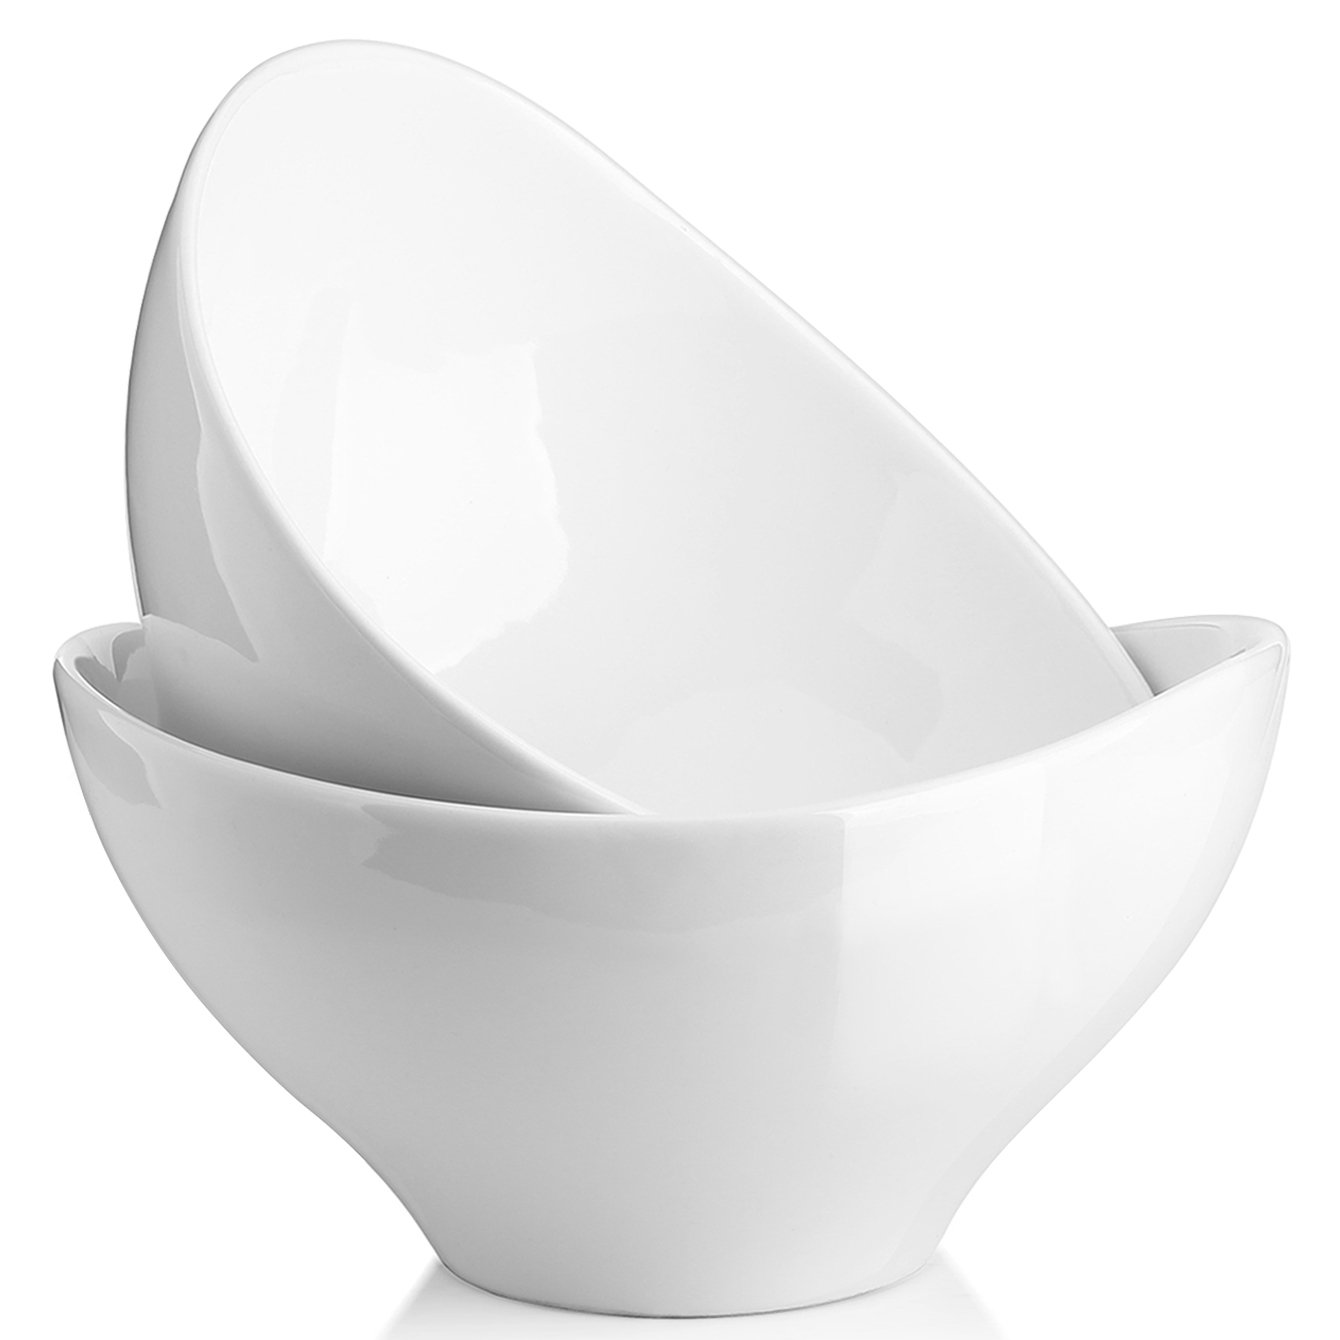 DOWAN 1.4-Quart Porcelain Serving Bowl Set, Party Snack or Salad Bowls, Set of 2, White